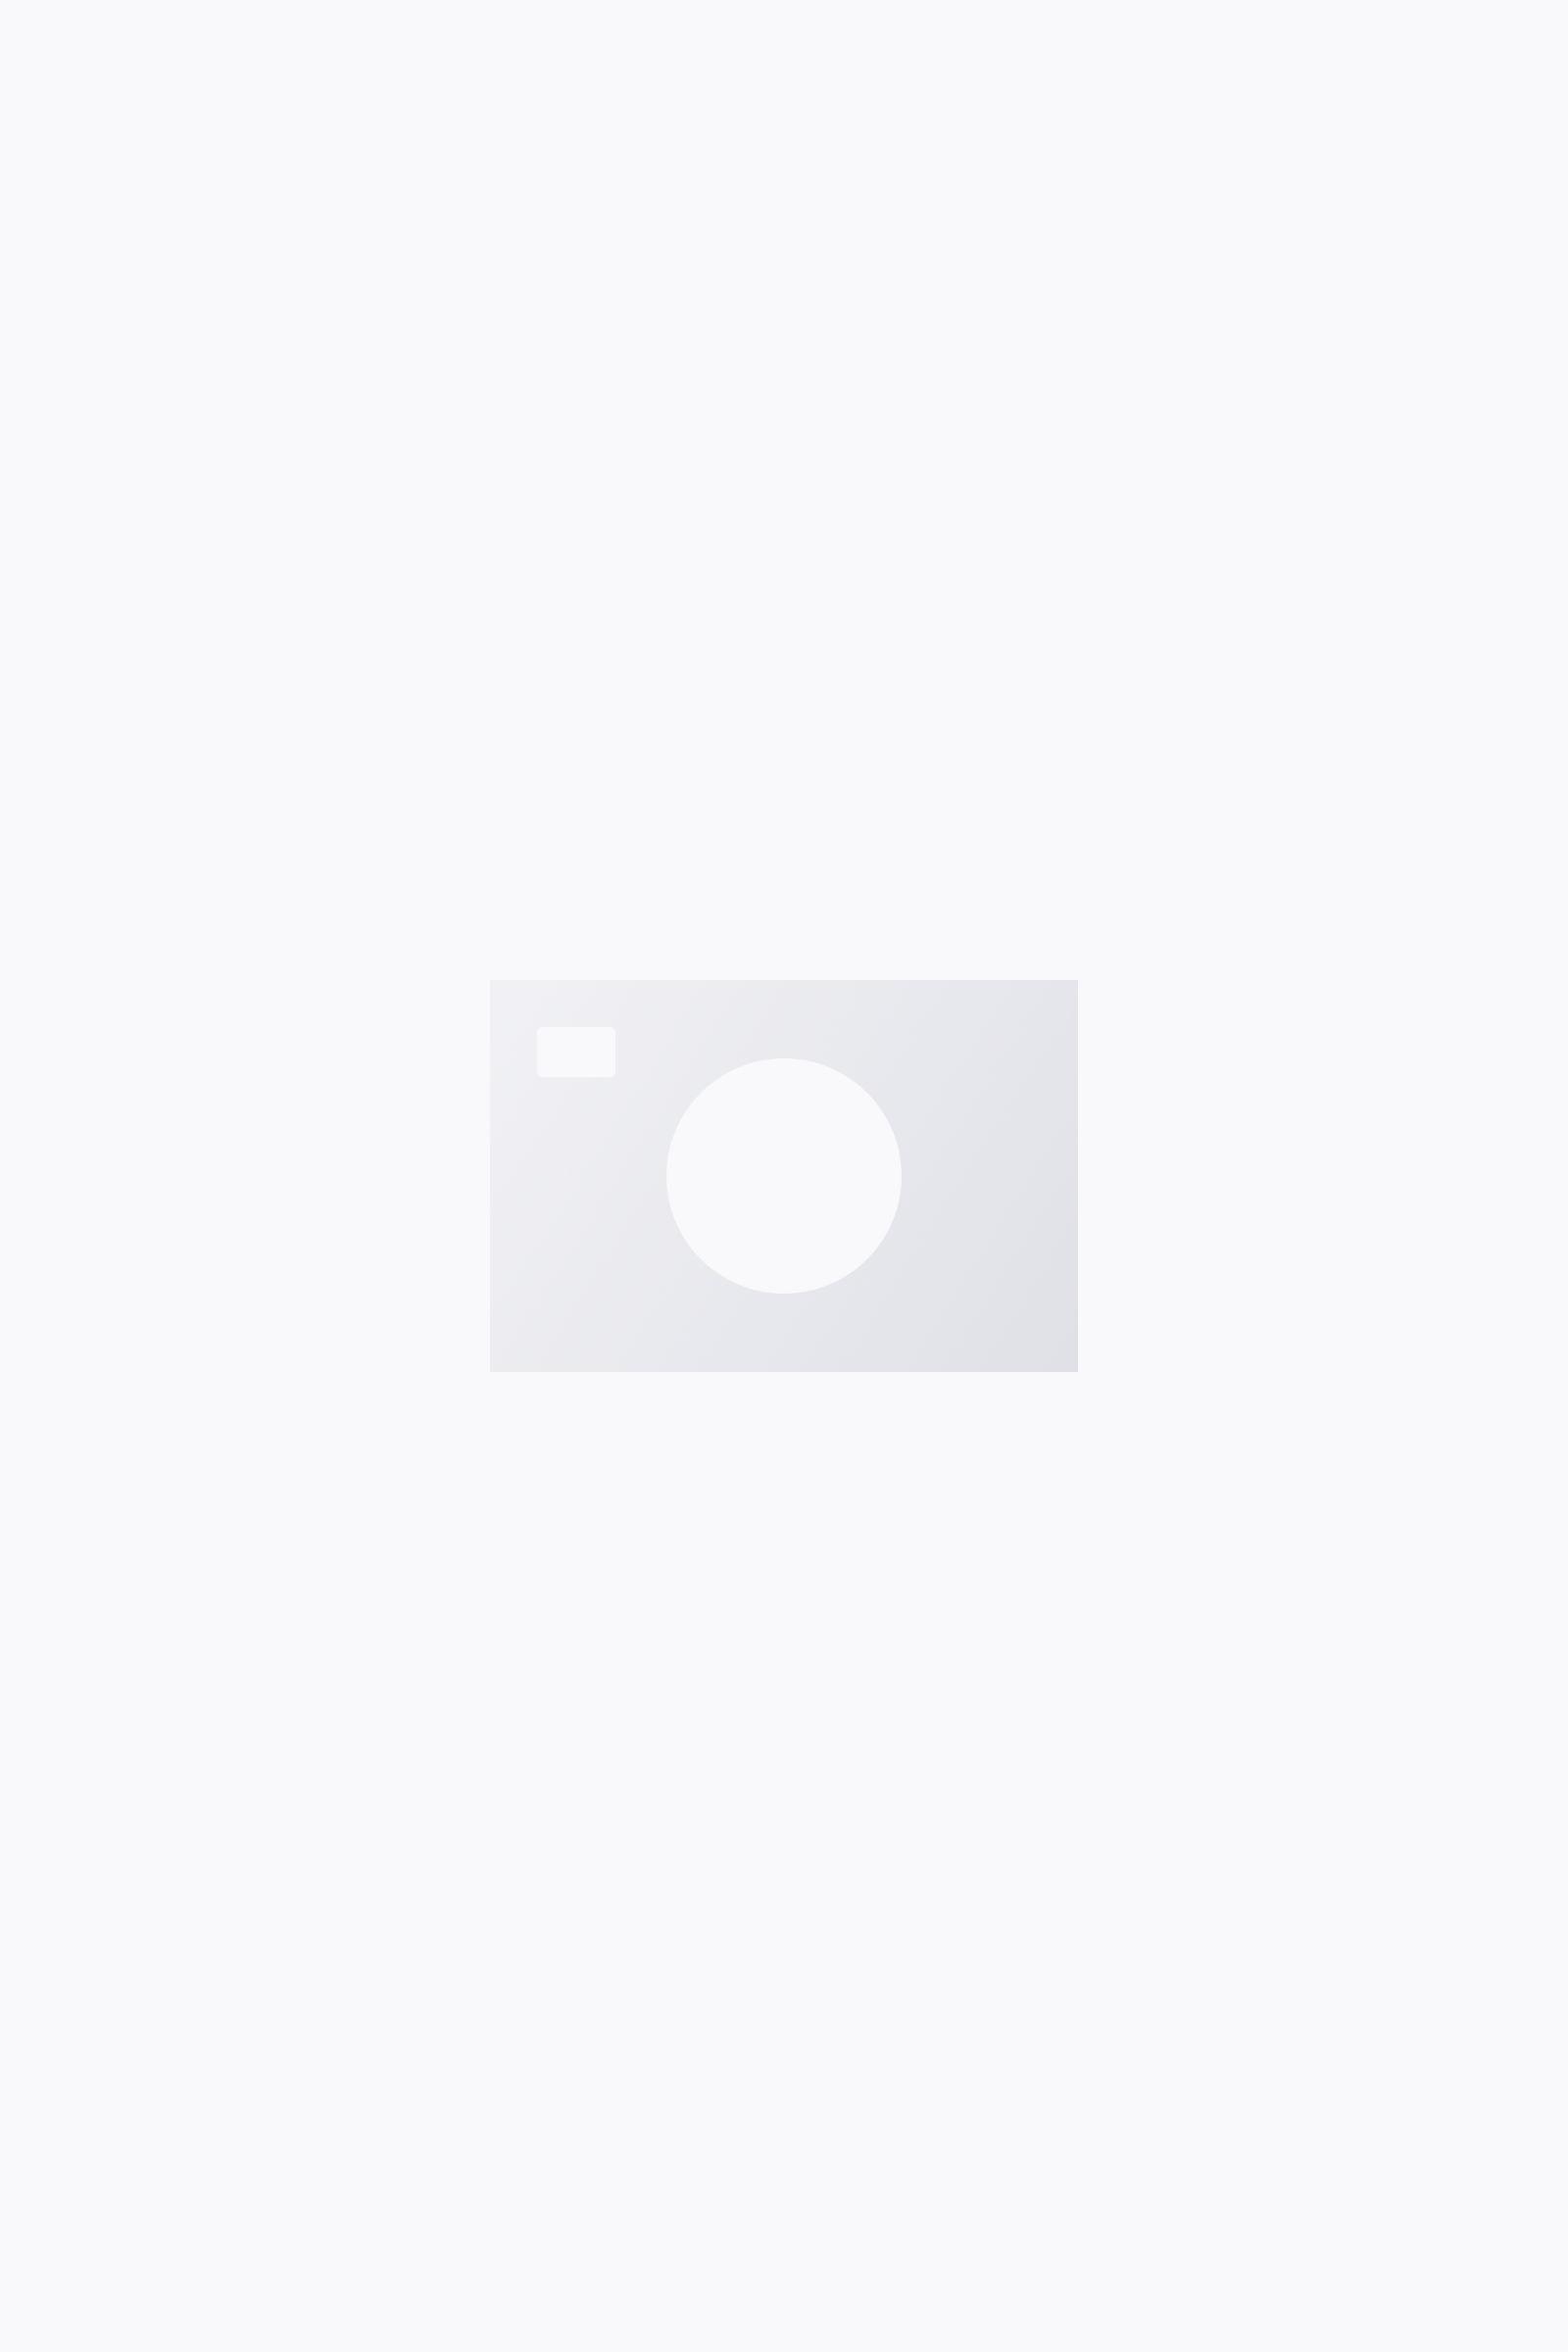 COS SEERSUCKER COTTON SHORTS,Black